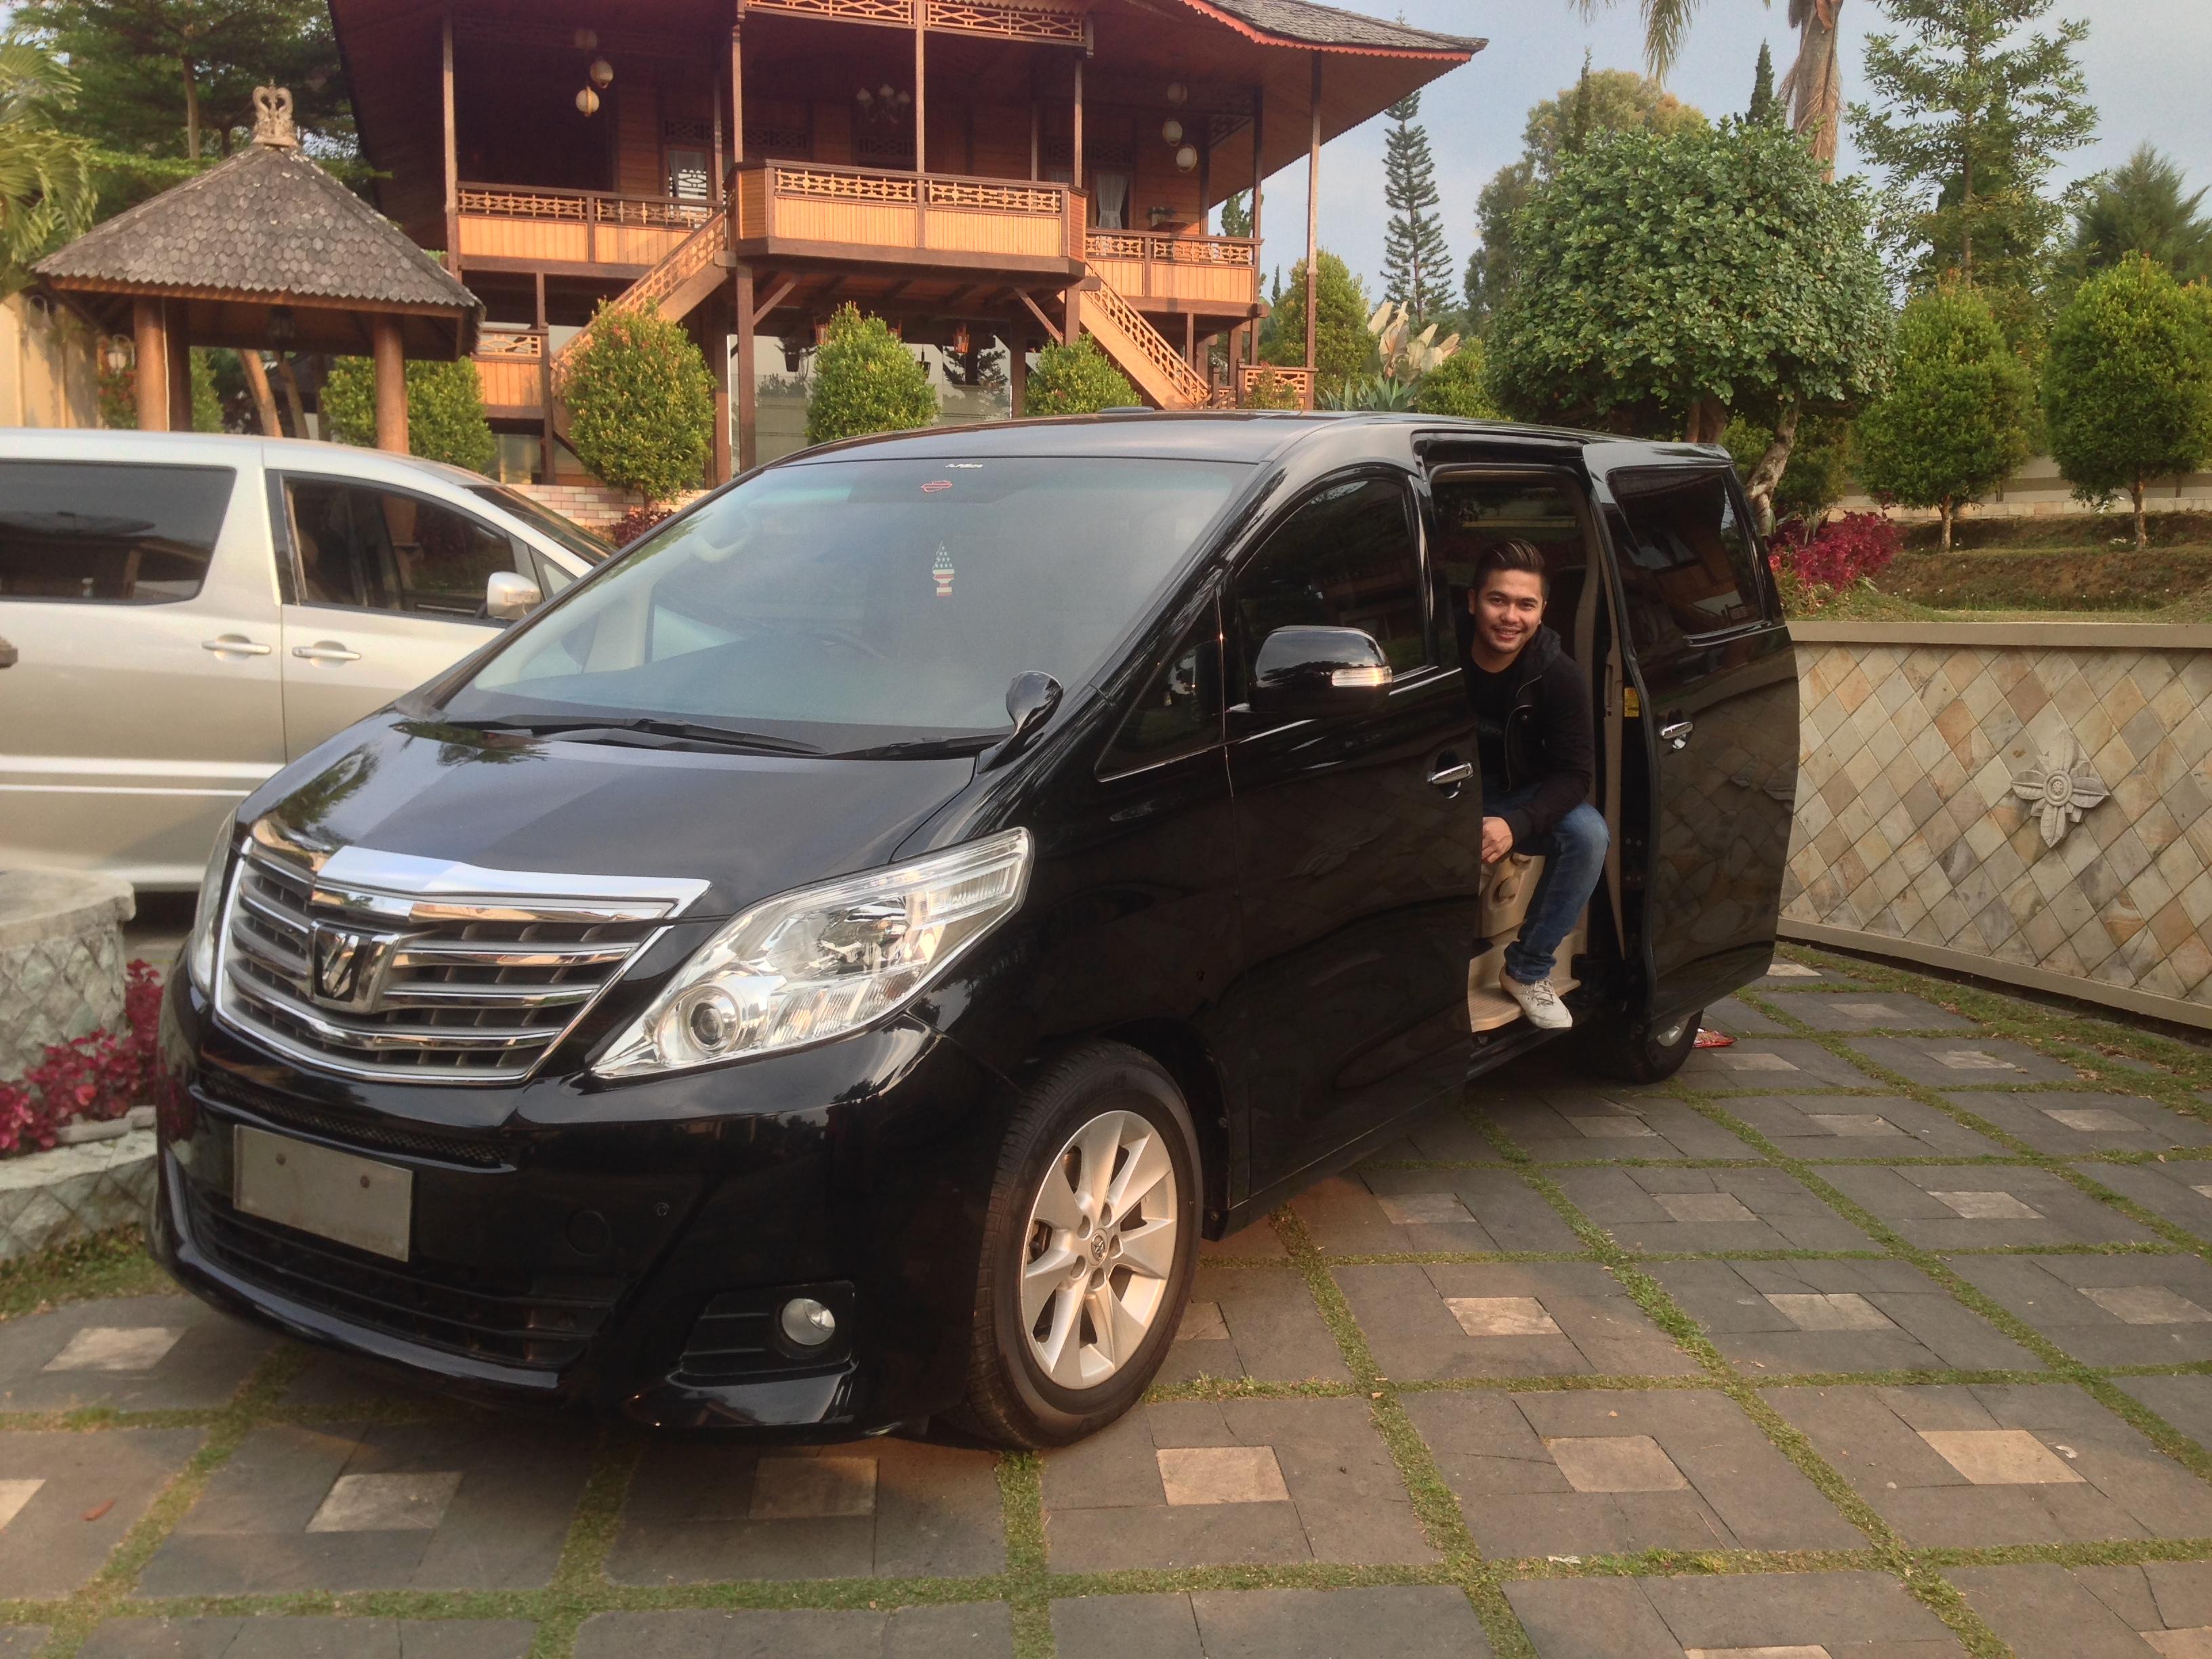 harga mobil all new vellfire grand avanza 2015 kaskus pusat rental alphard queen jakarta 1 777